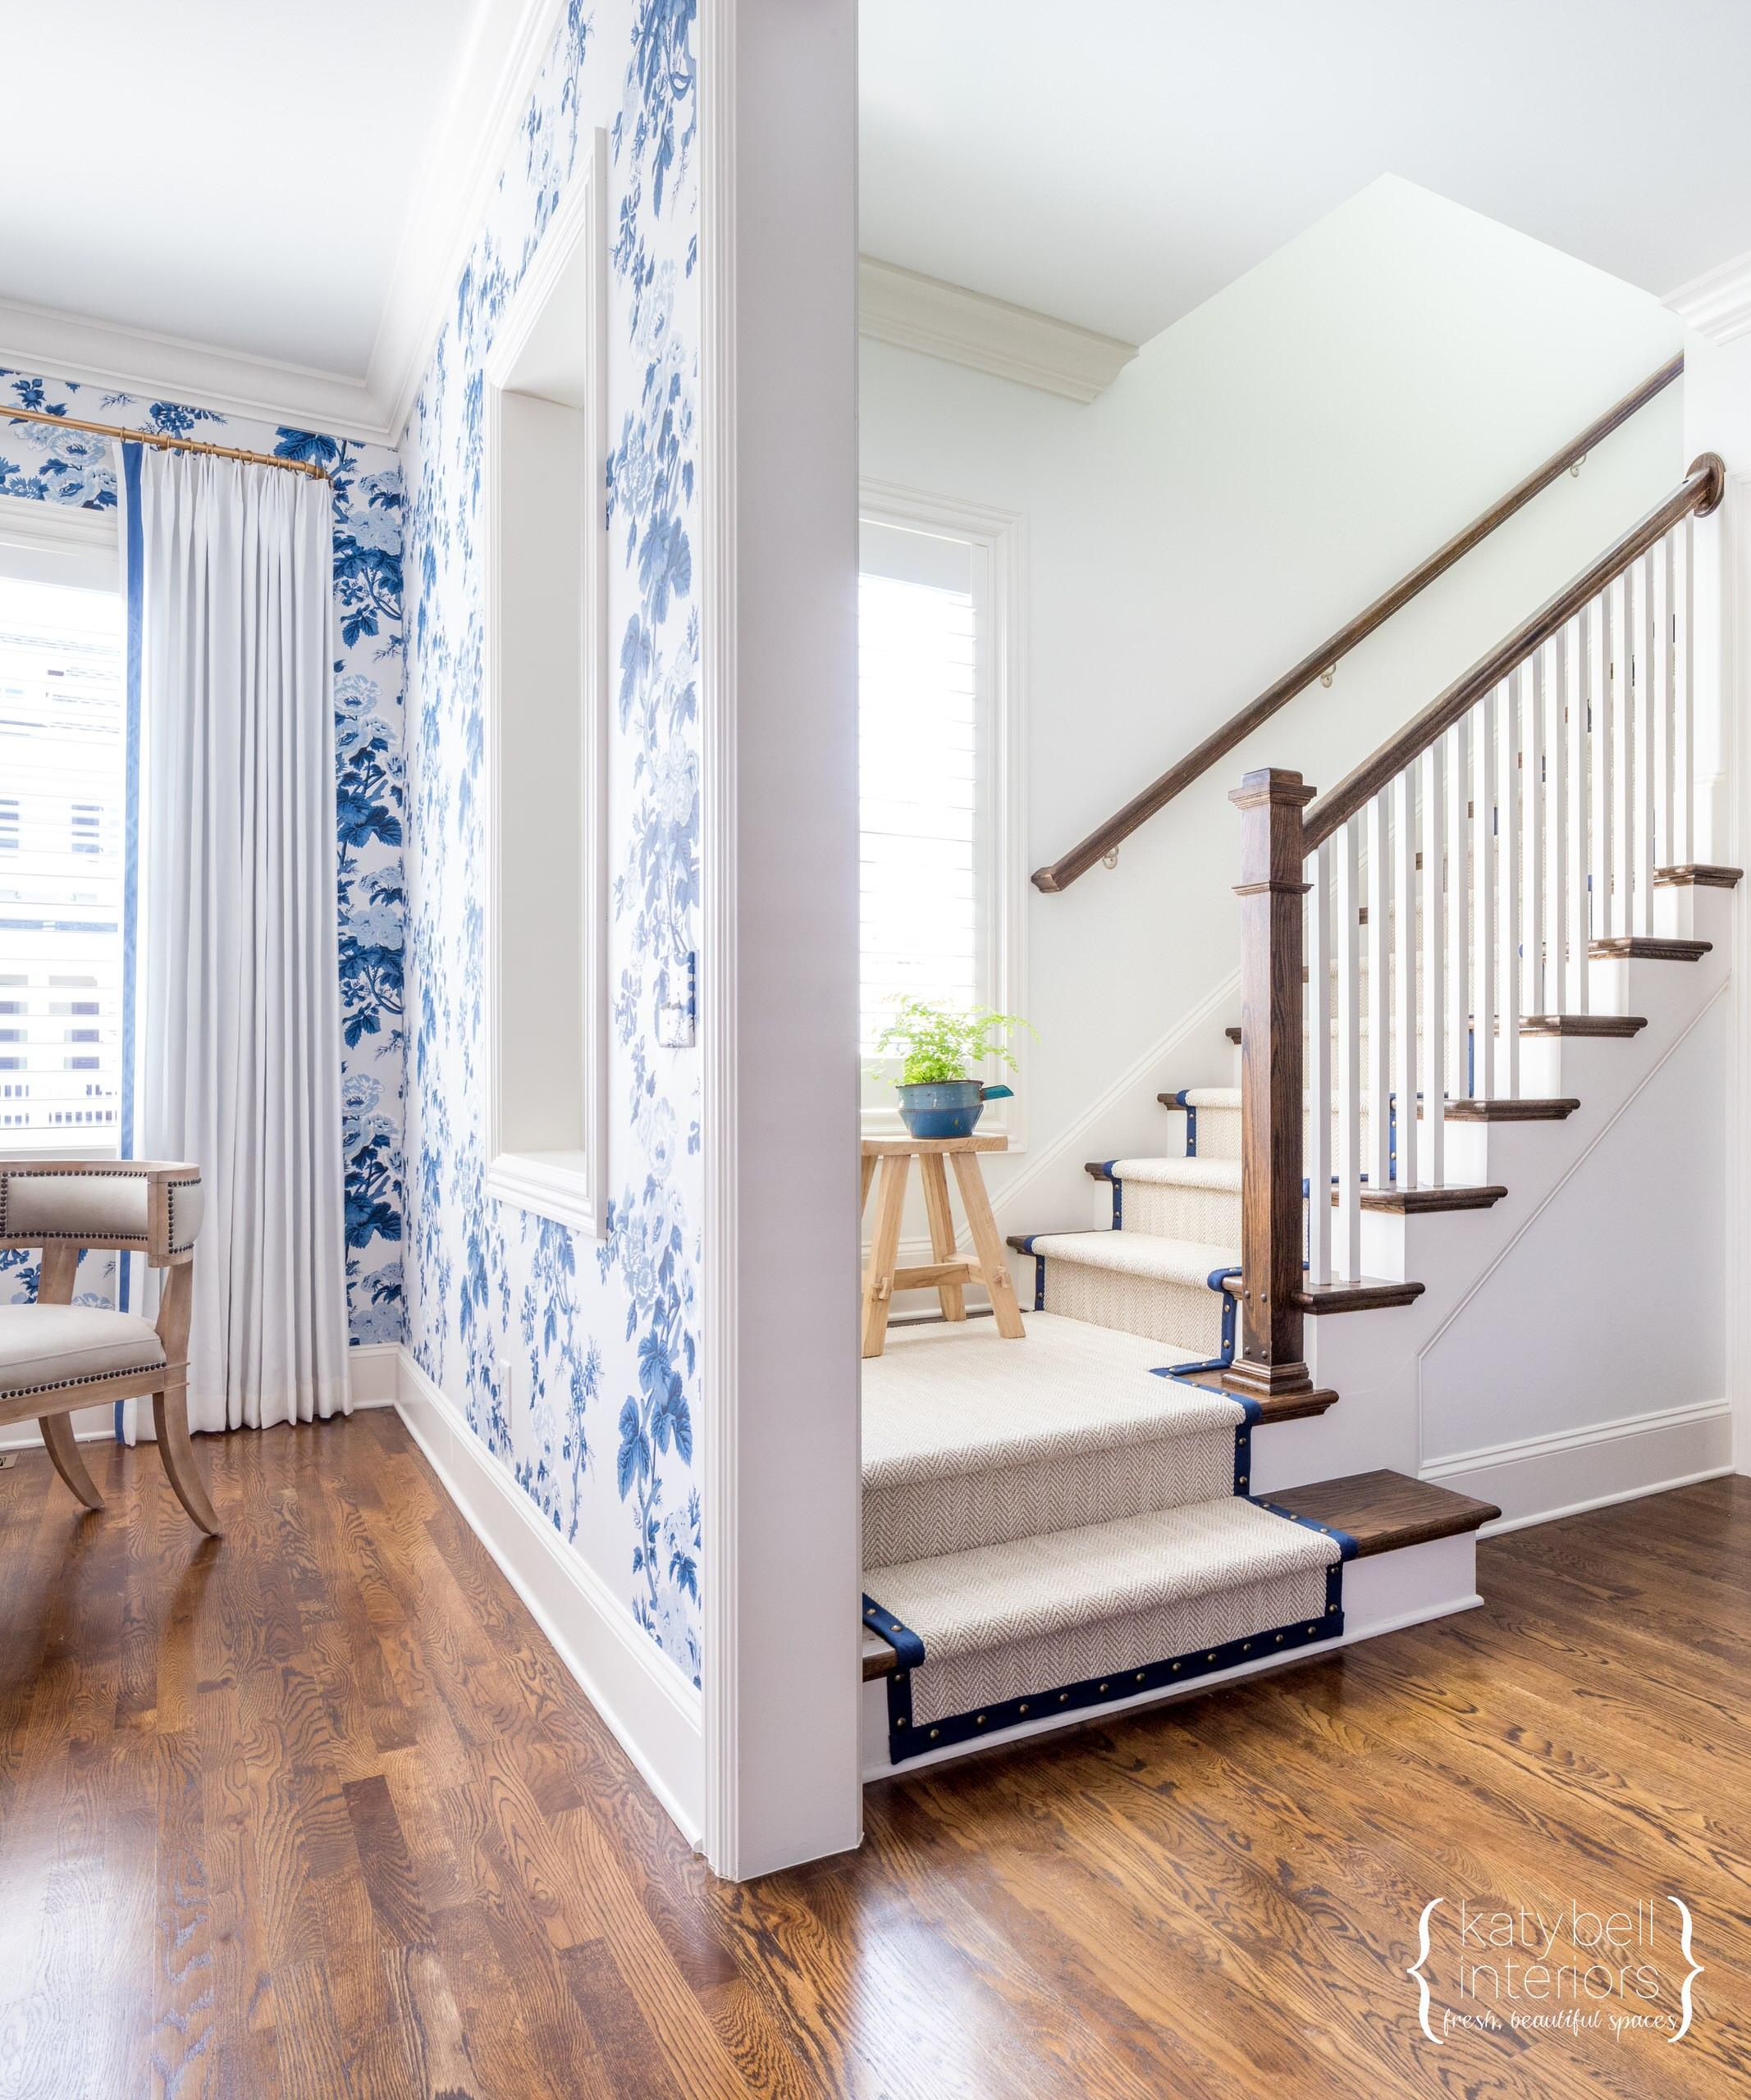 Modern Blue Floral Wallcovering